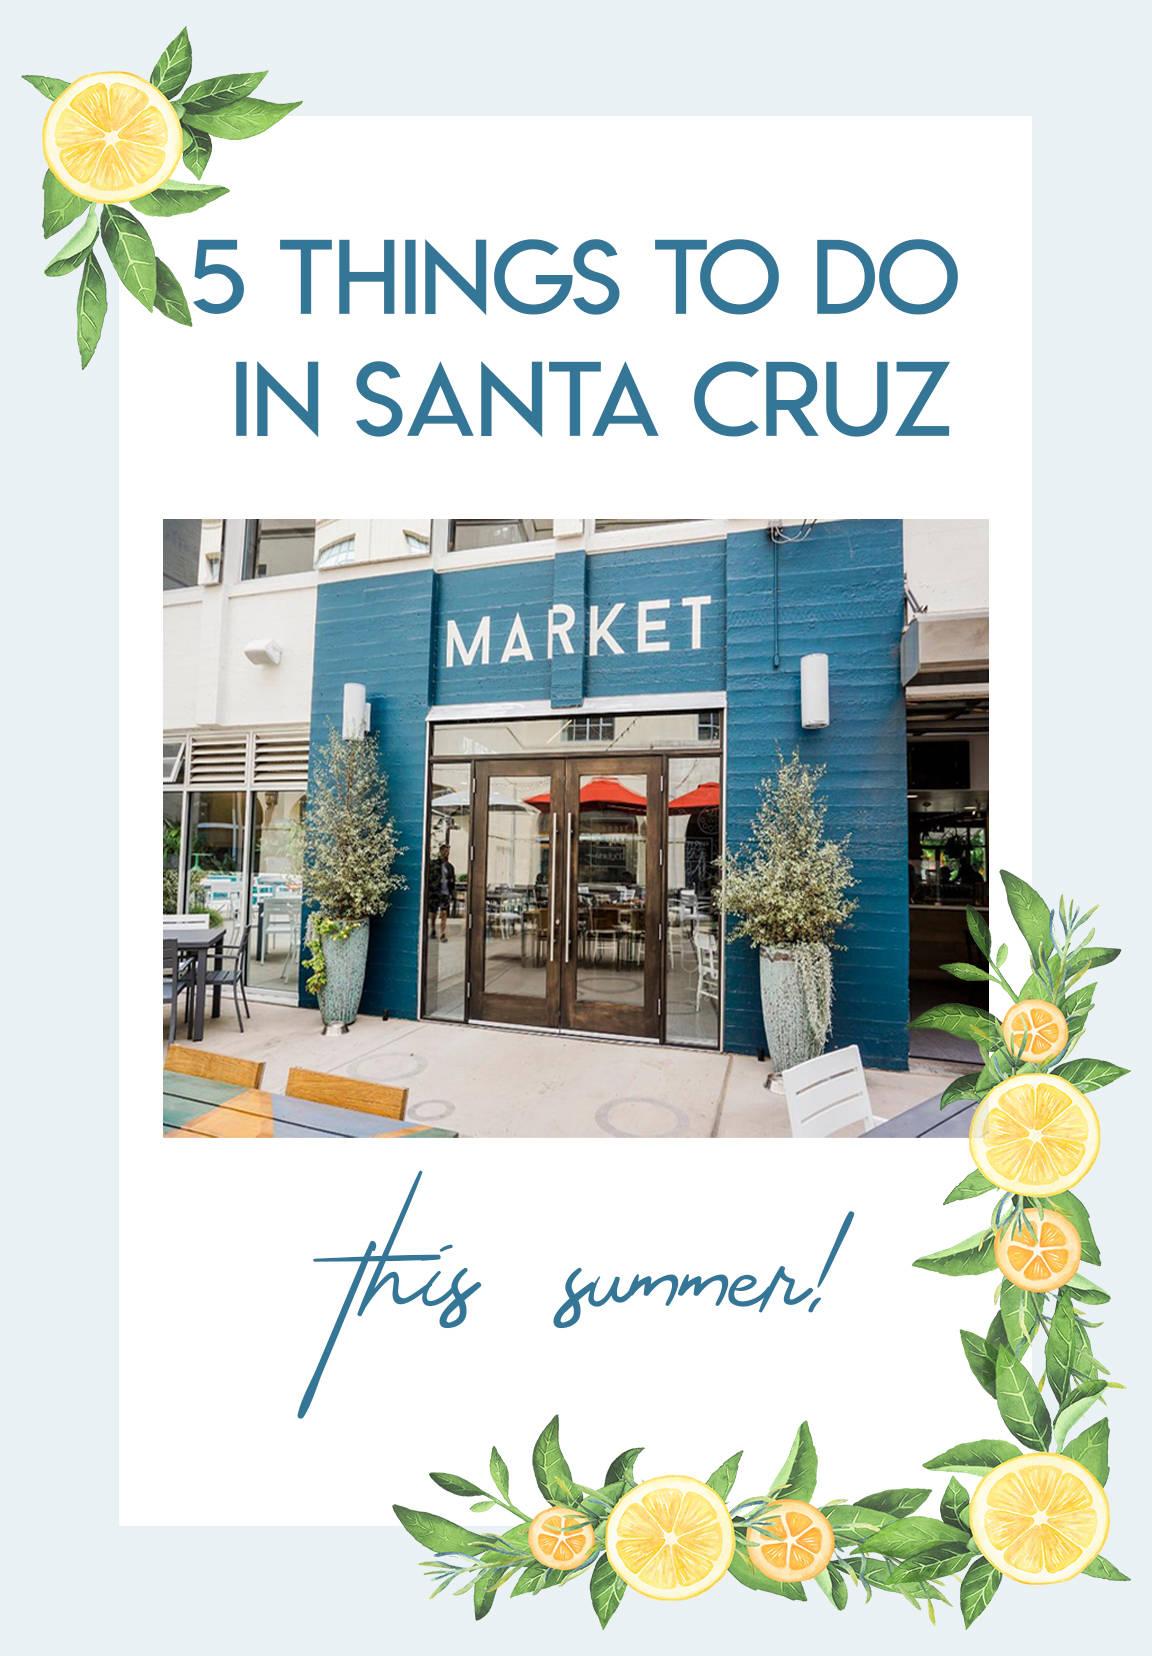 5 Things To Do In Santa Cruz